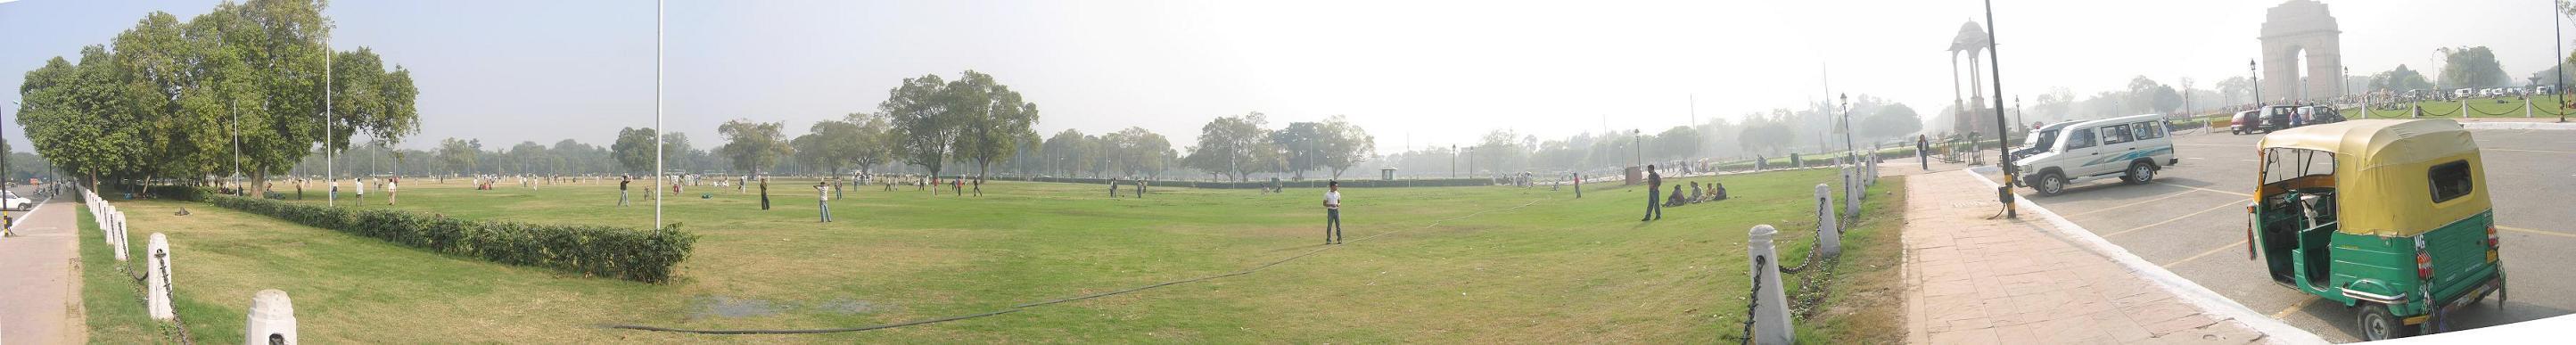 India_delhi_indiagate